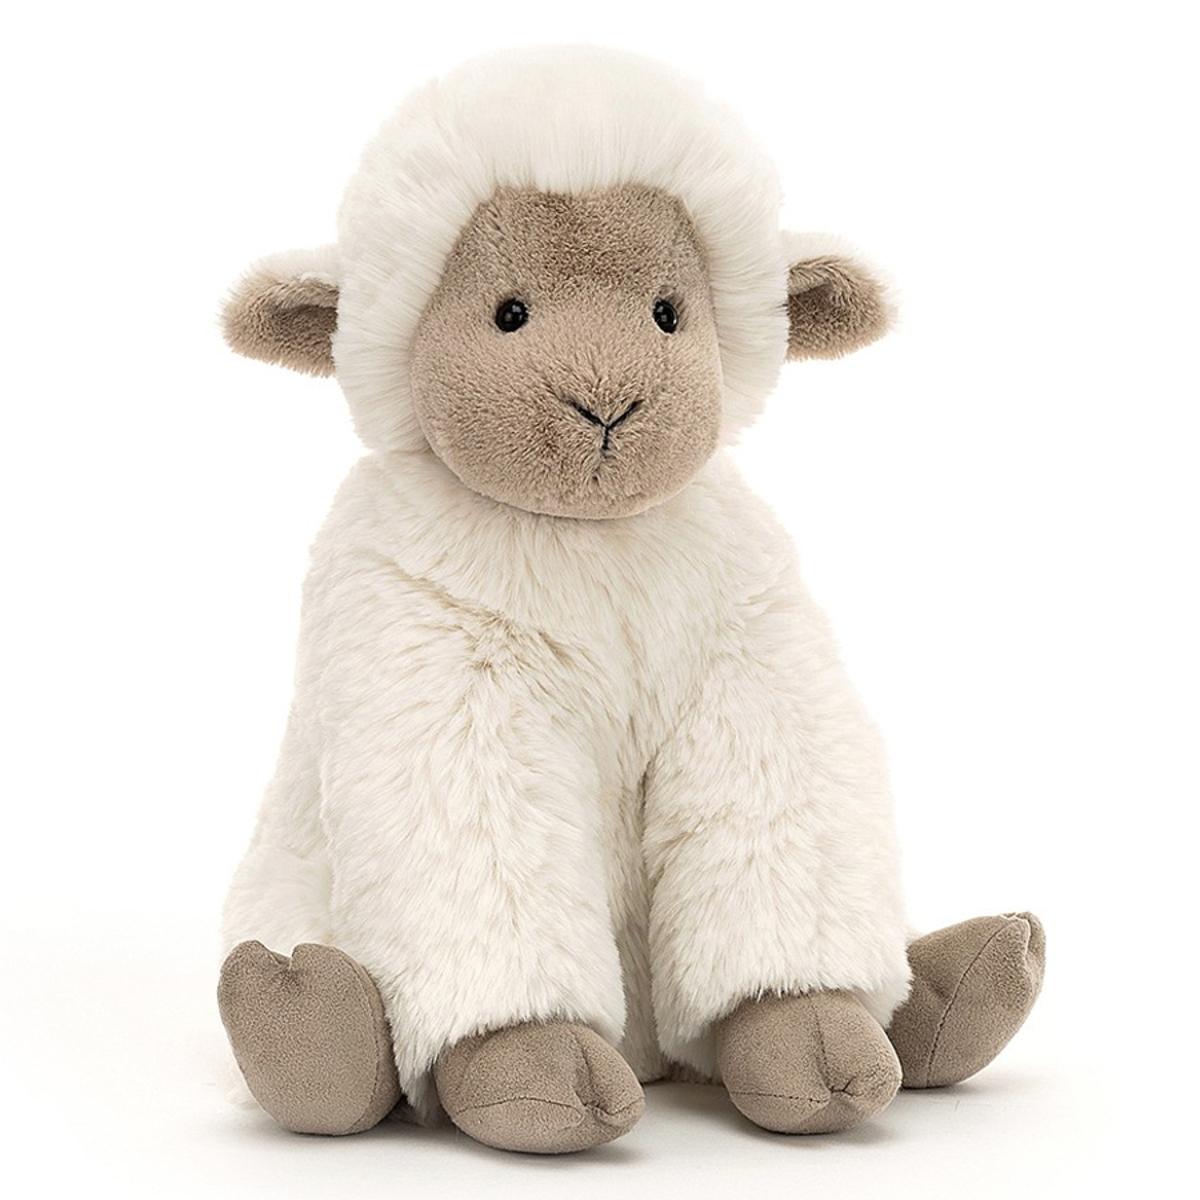 Peluche Libby Lamb - Medium Peluche Agneau 26 cm